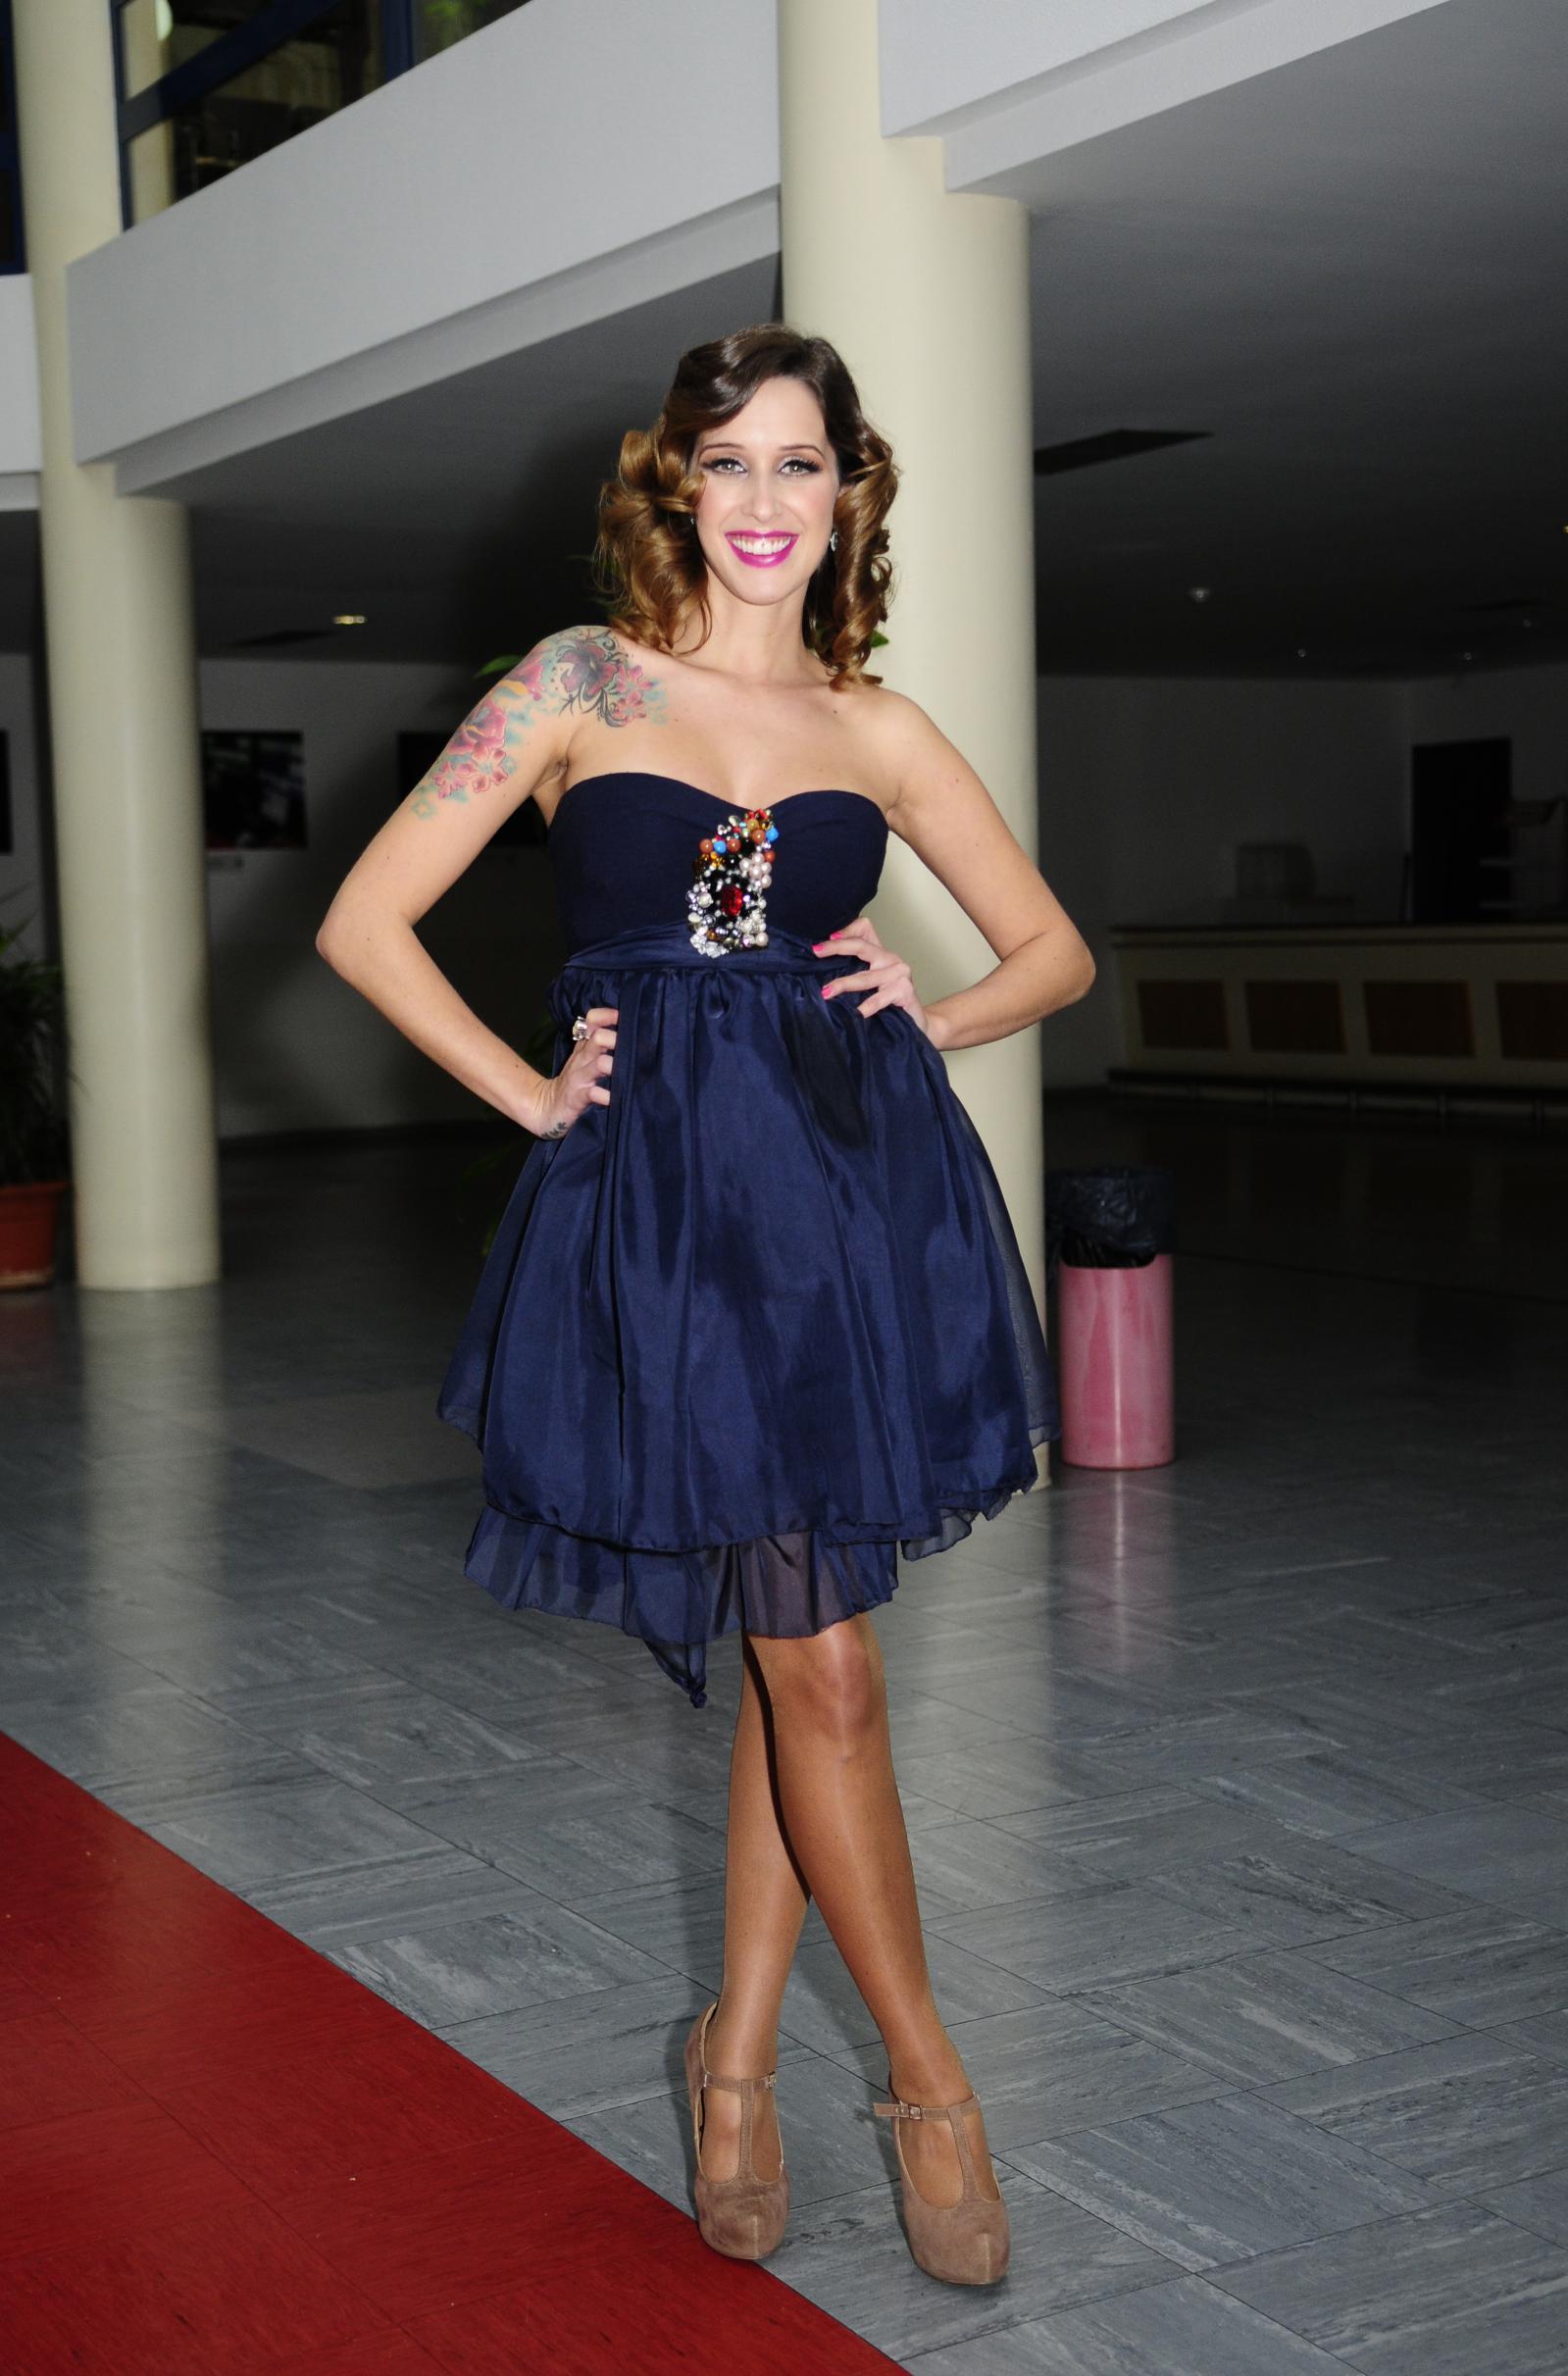 Érica Silva